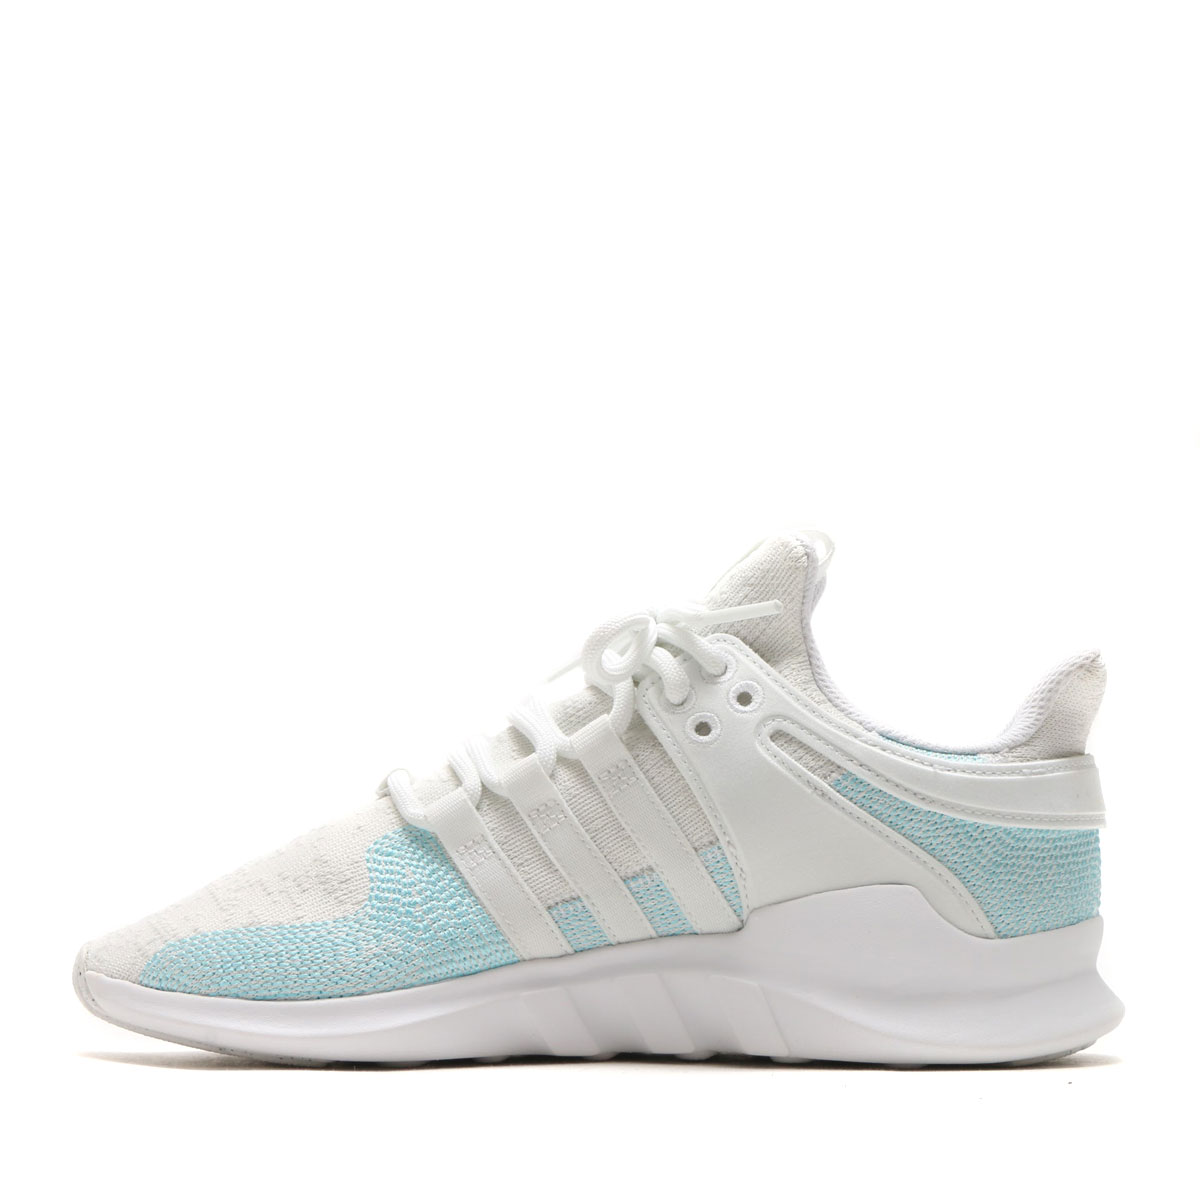 adidas Originals EQT SUPPORT ADV CK PARLEY (Adidas originals EQT support CK soft headed Ray) Running WhiteBlue SpritOff White